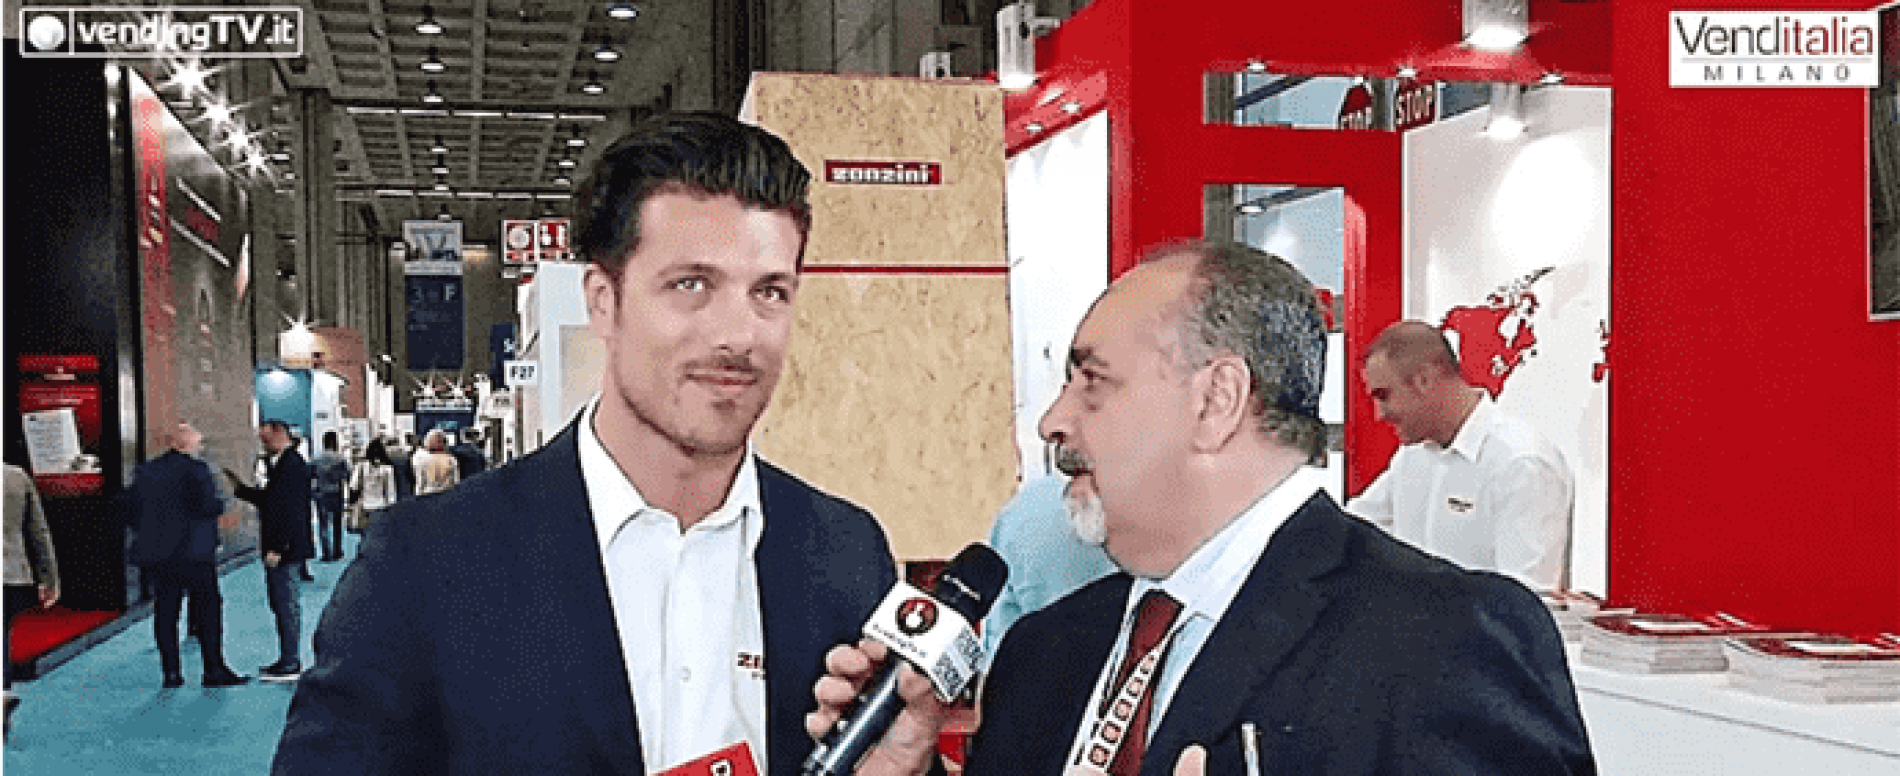 Venditalia 2018. Intervista con Jacopo Zonzini – Zonzini srl